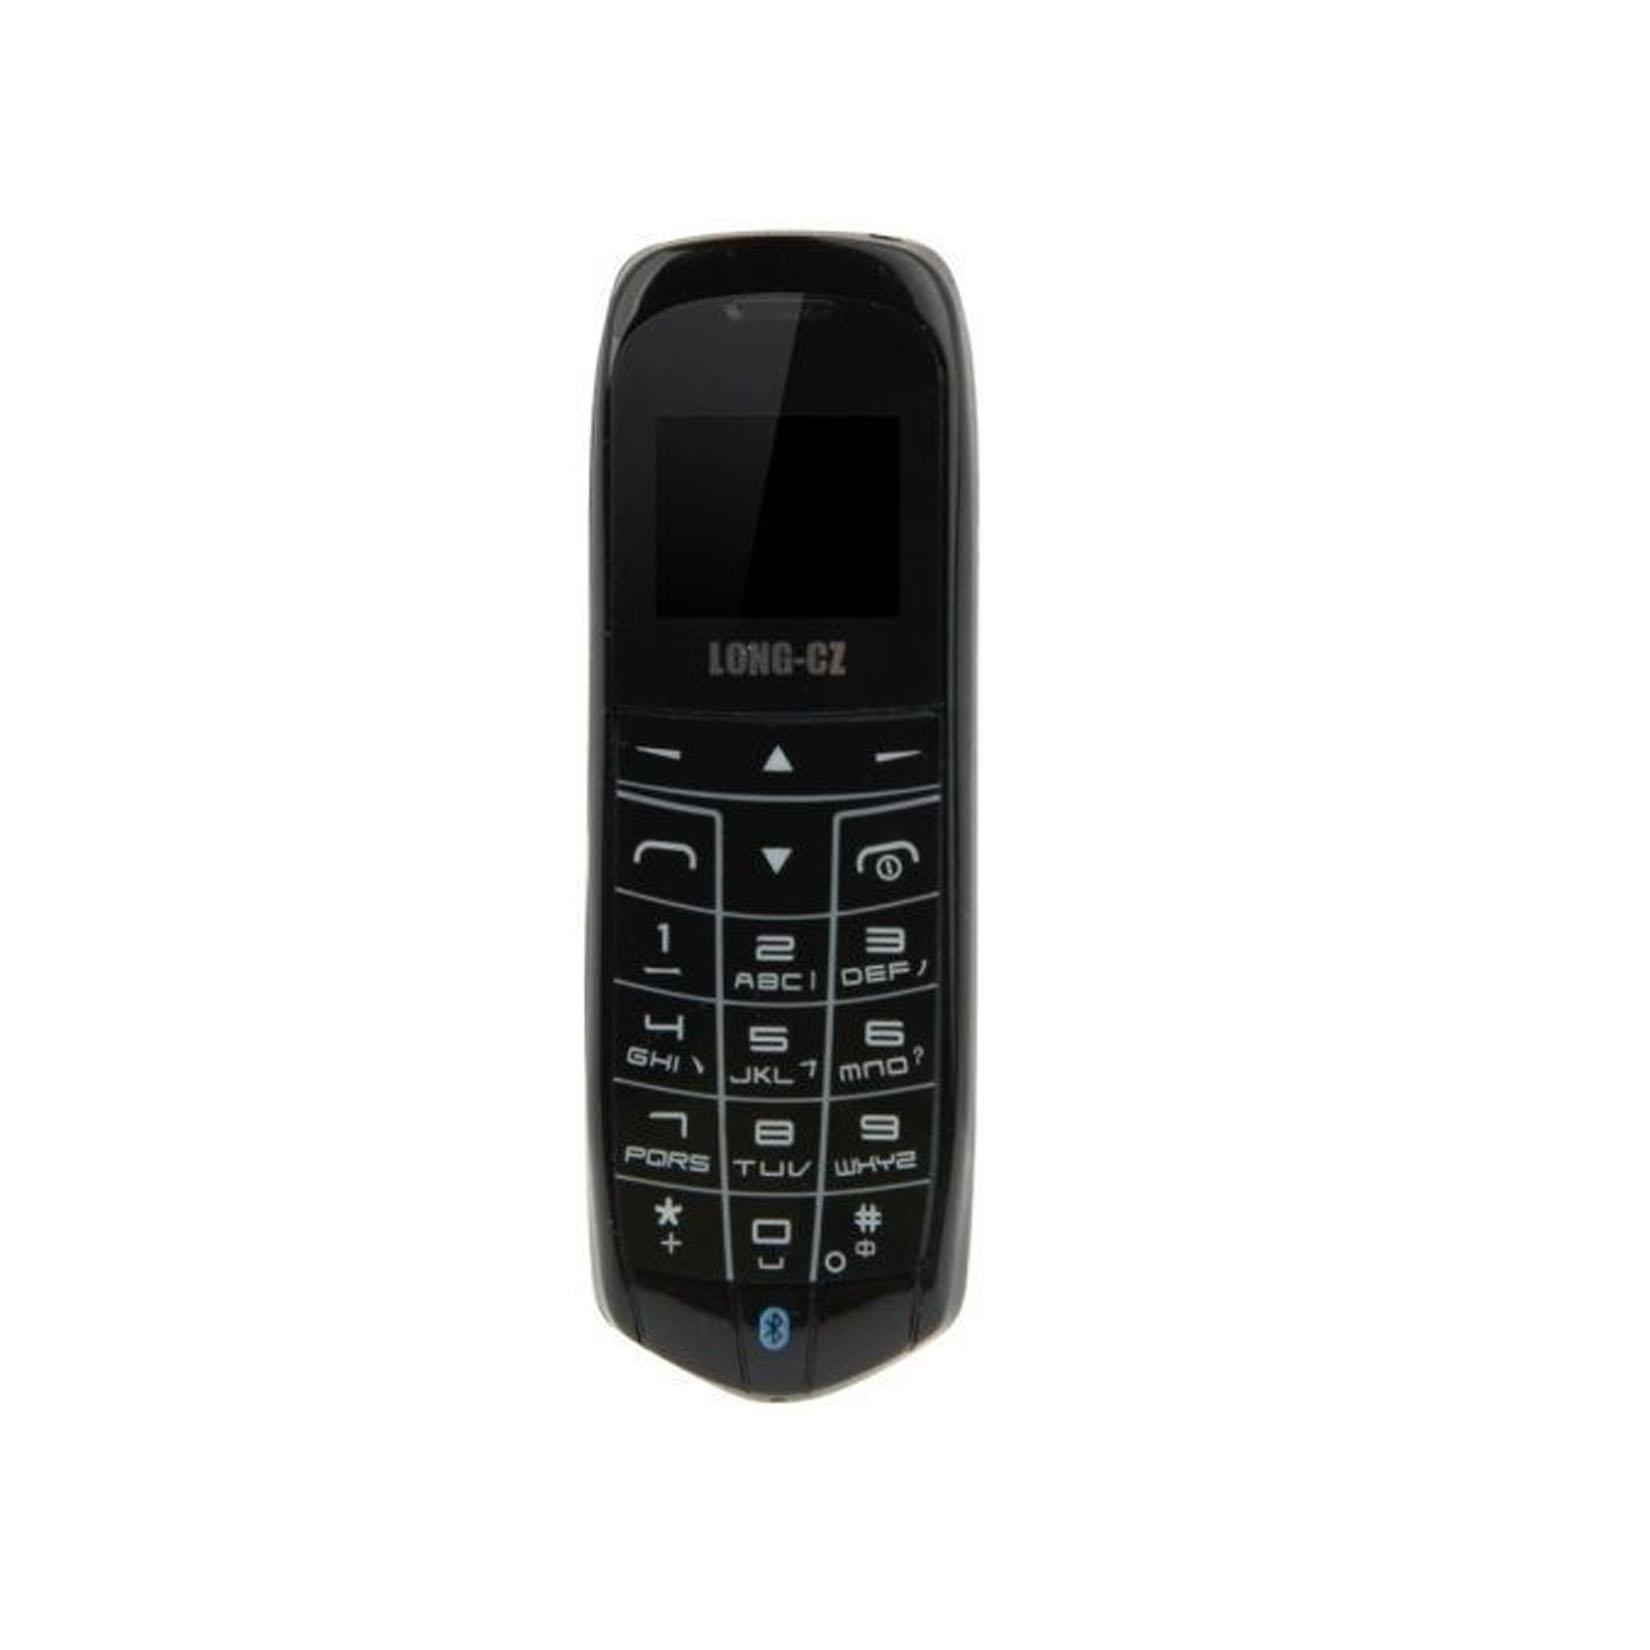 long cz j8 mobile phone mini bluetooth smartphone ebay. Black Bedroom Furniture Sets. Home Design Ideas